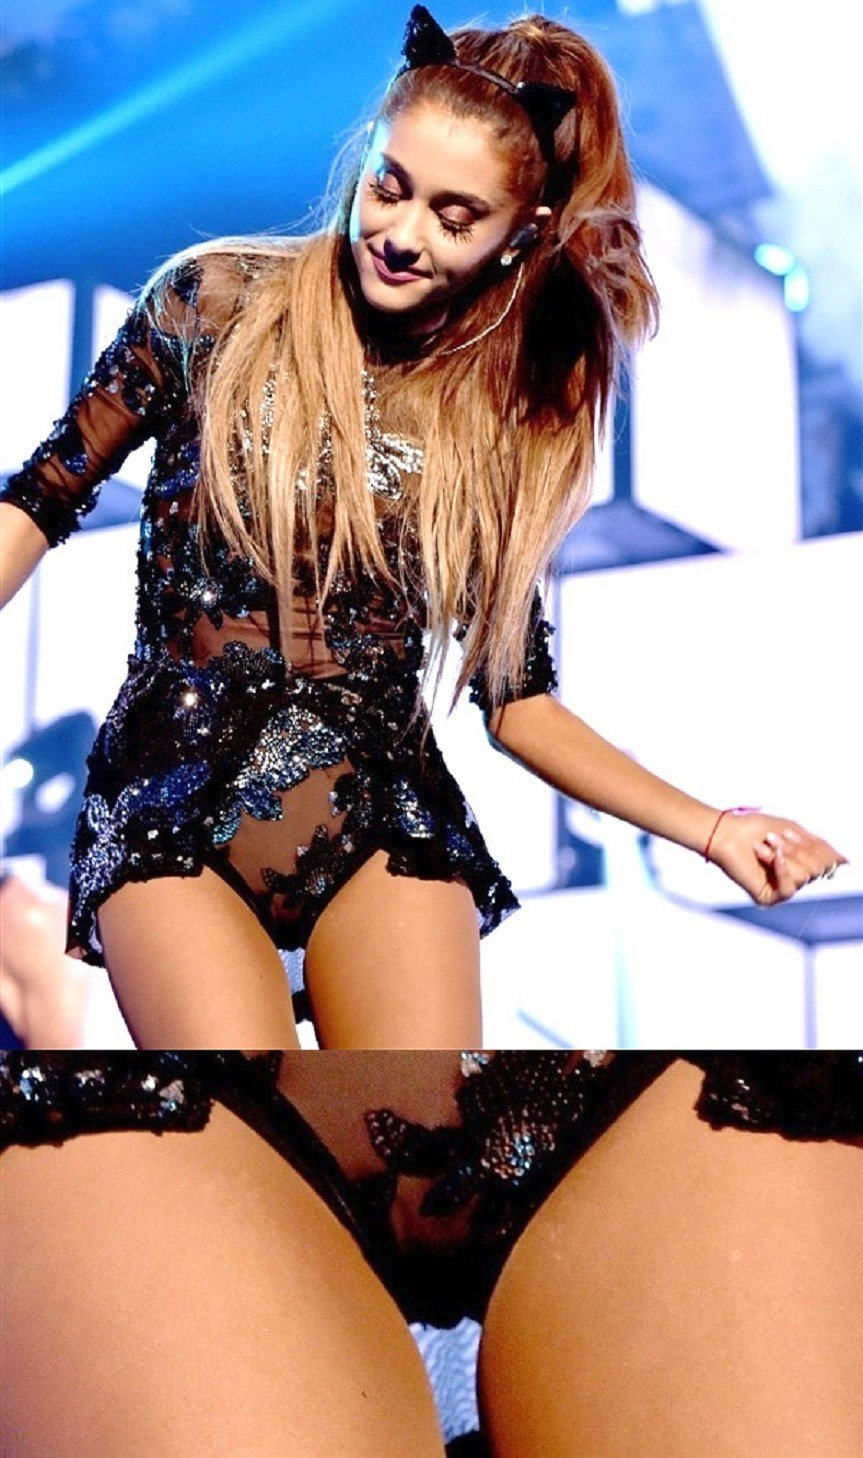 Ariana Grande Nude hot leak! ariana grande nude pics revealed [full set]